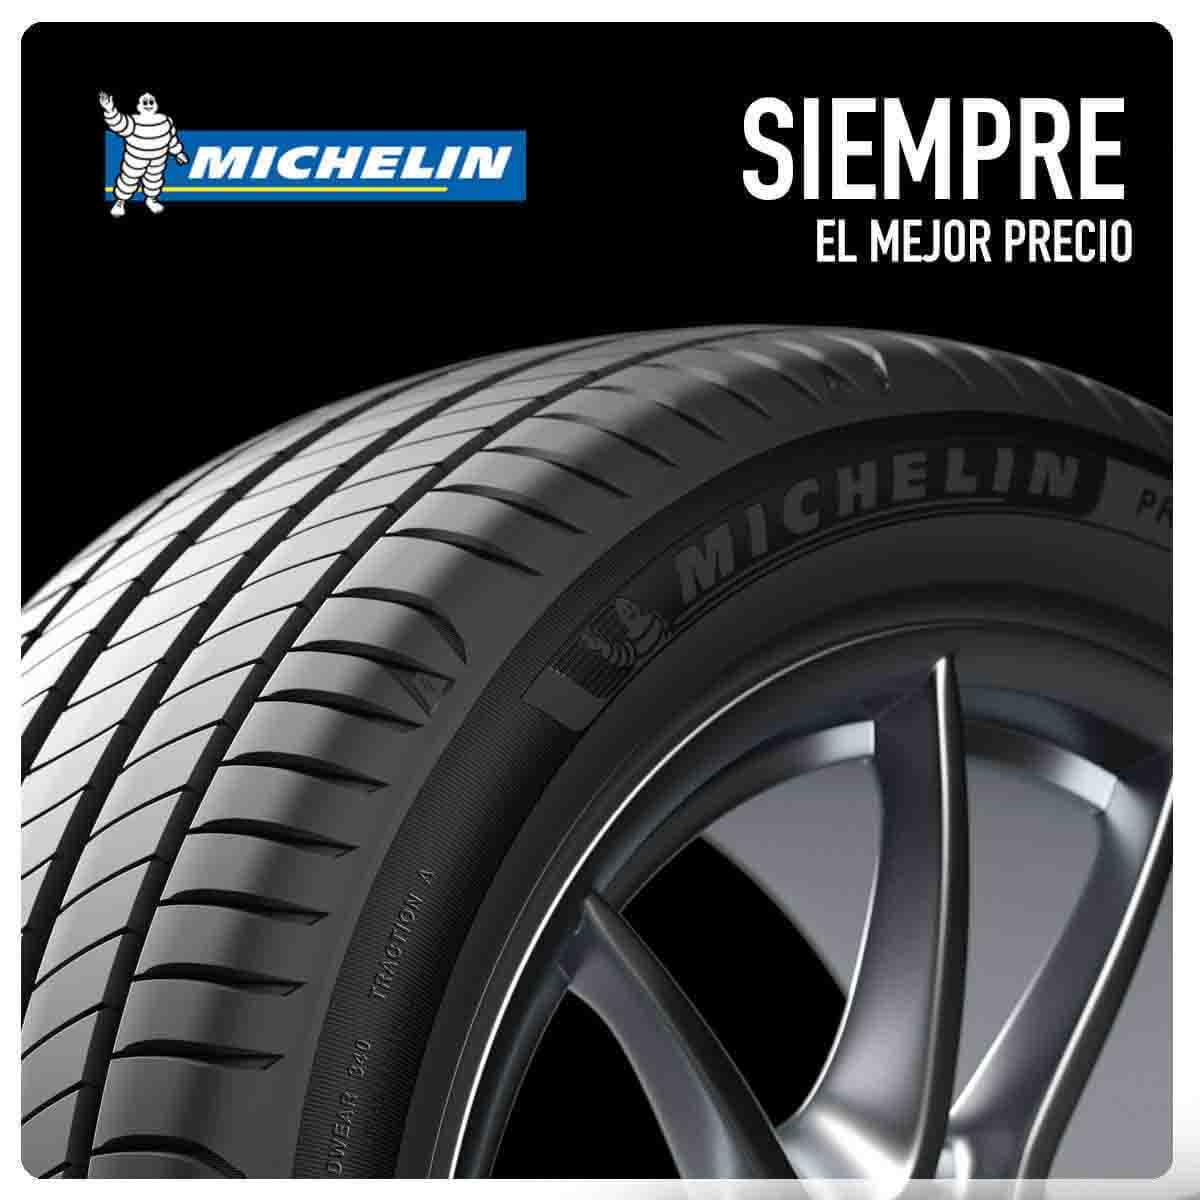 Neumáticos Michelin baratos en Madrid